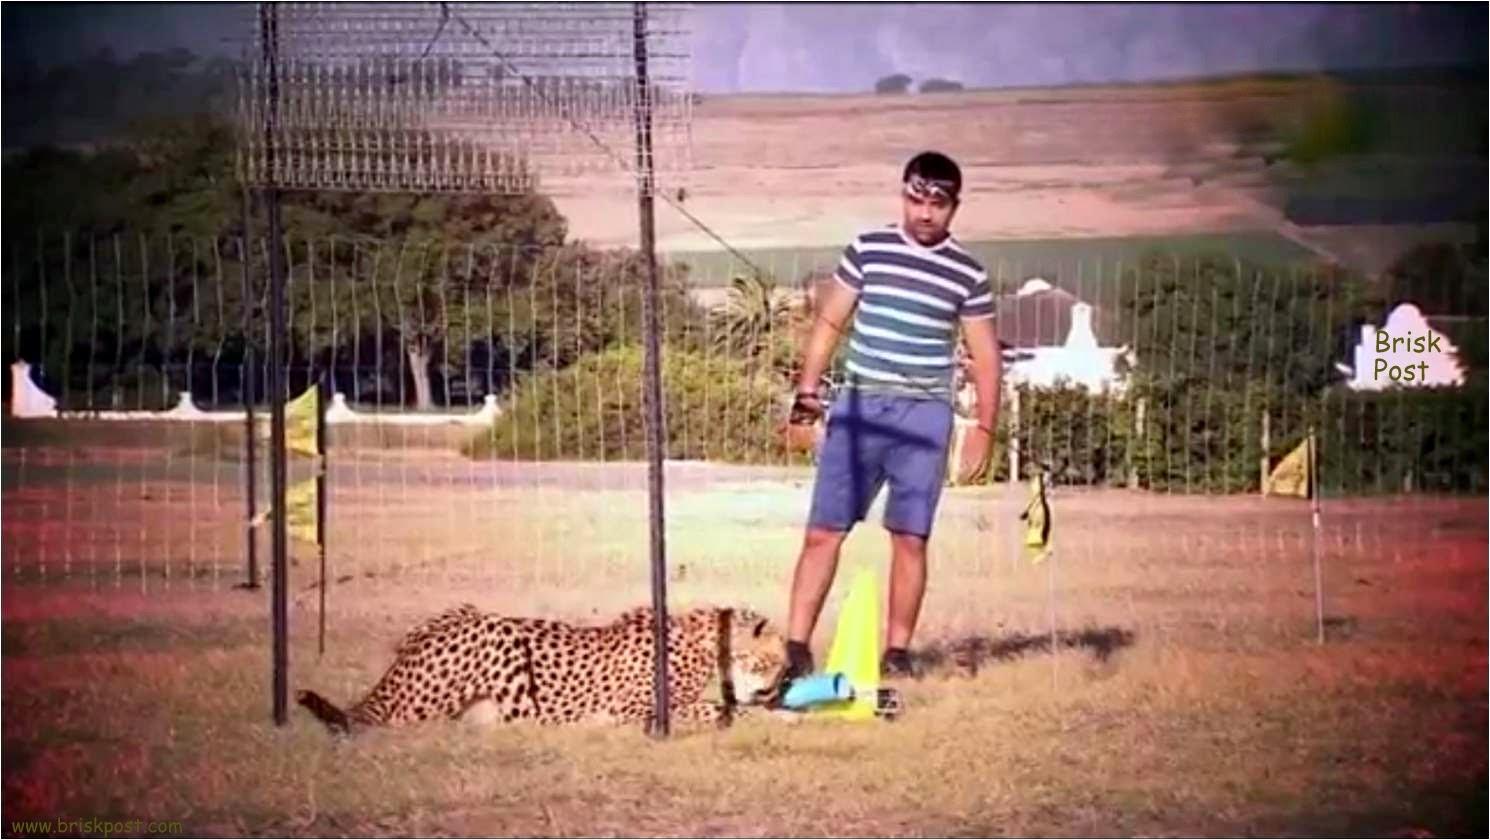 Fear Factor contestant Ajaz Khan near tiger after Aamna Saamna stunt in Khatron Ke Khiladi